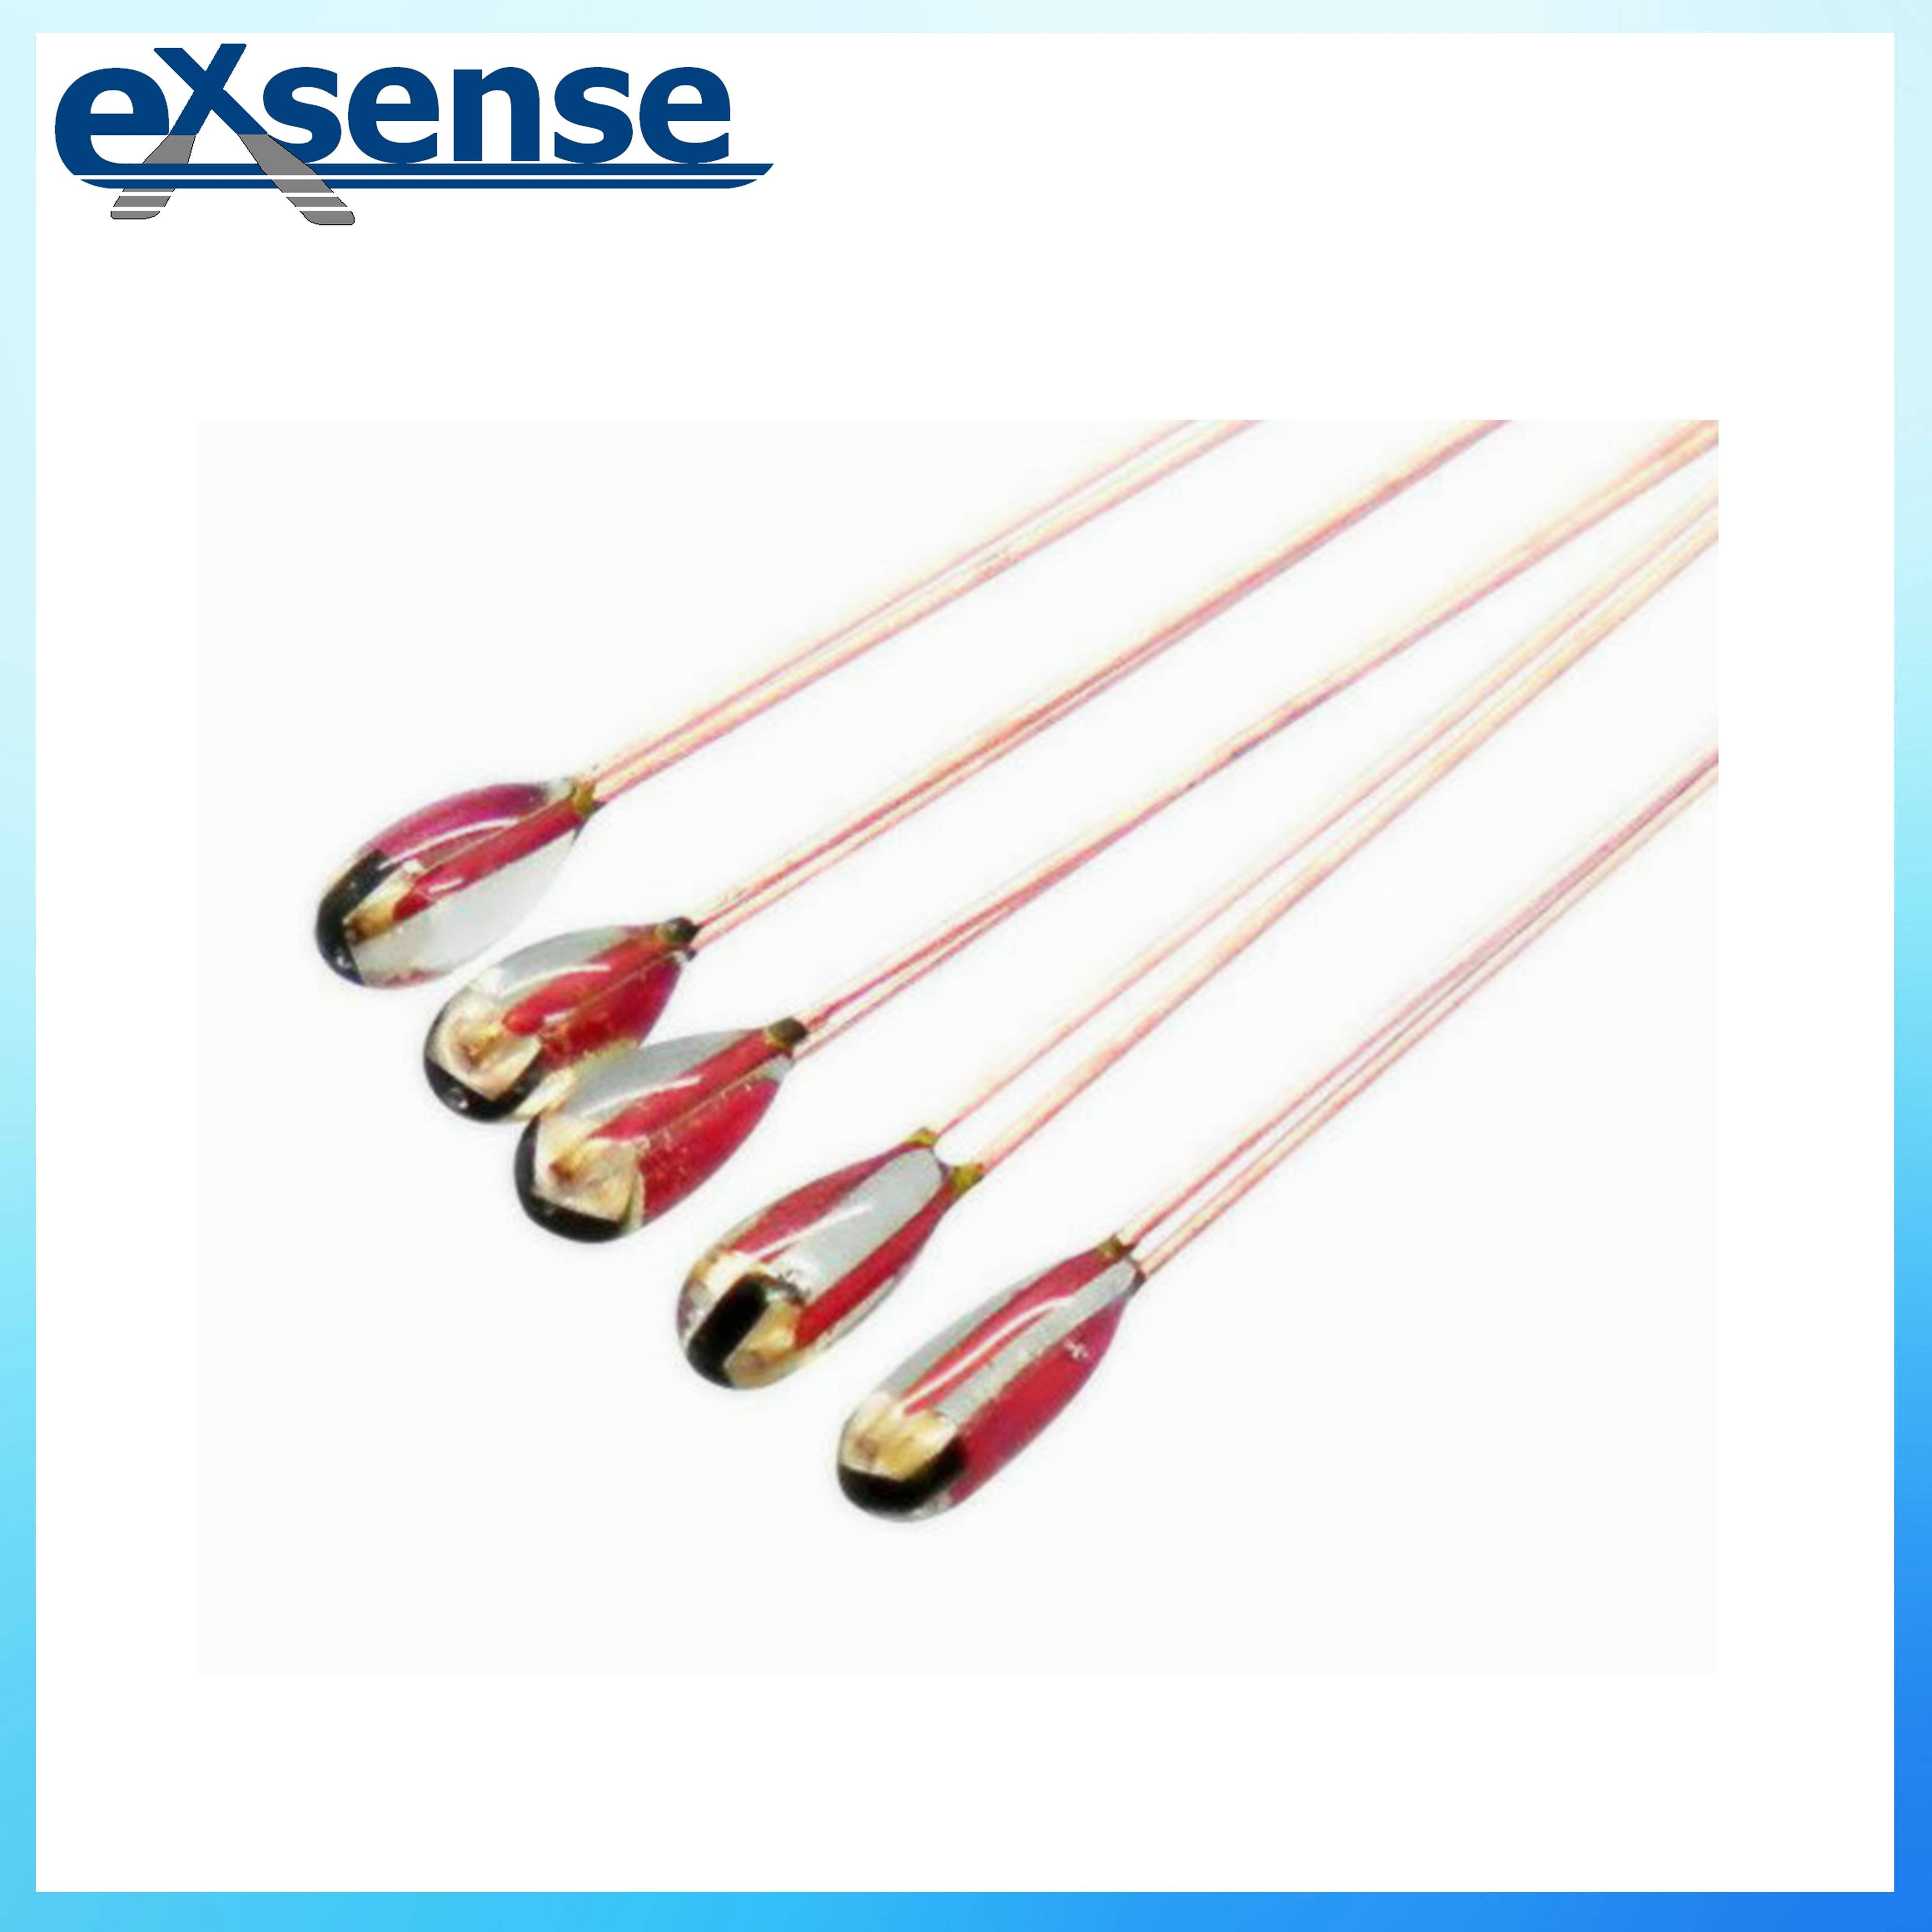 250C glass NTC thermistor with dumet wire